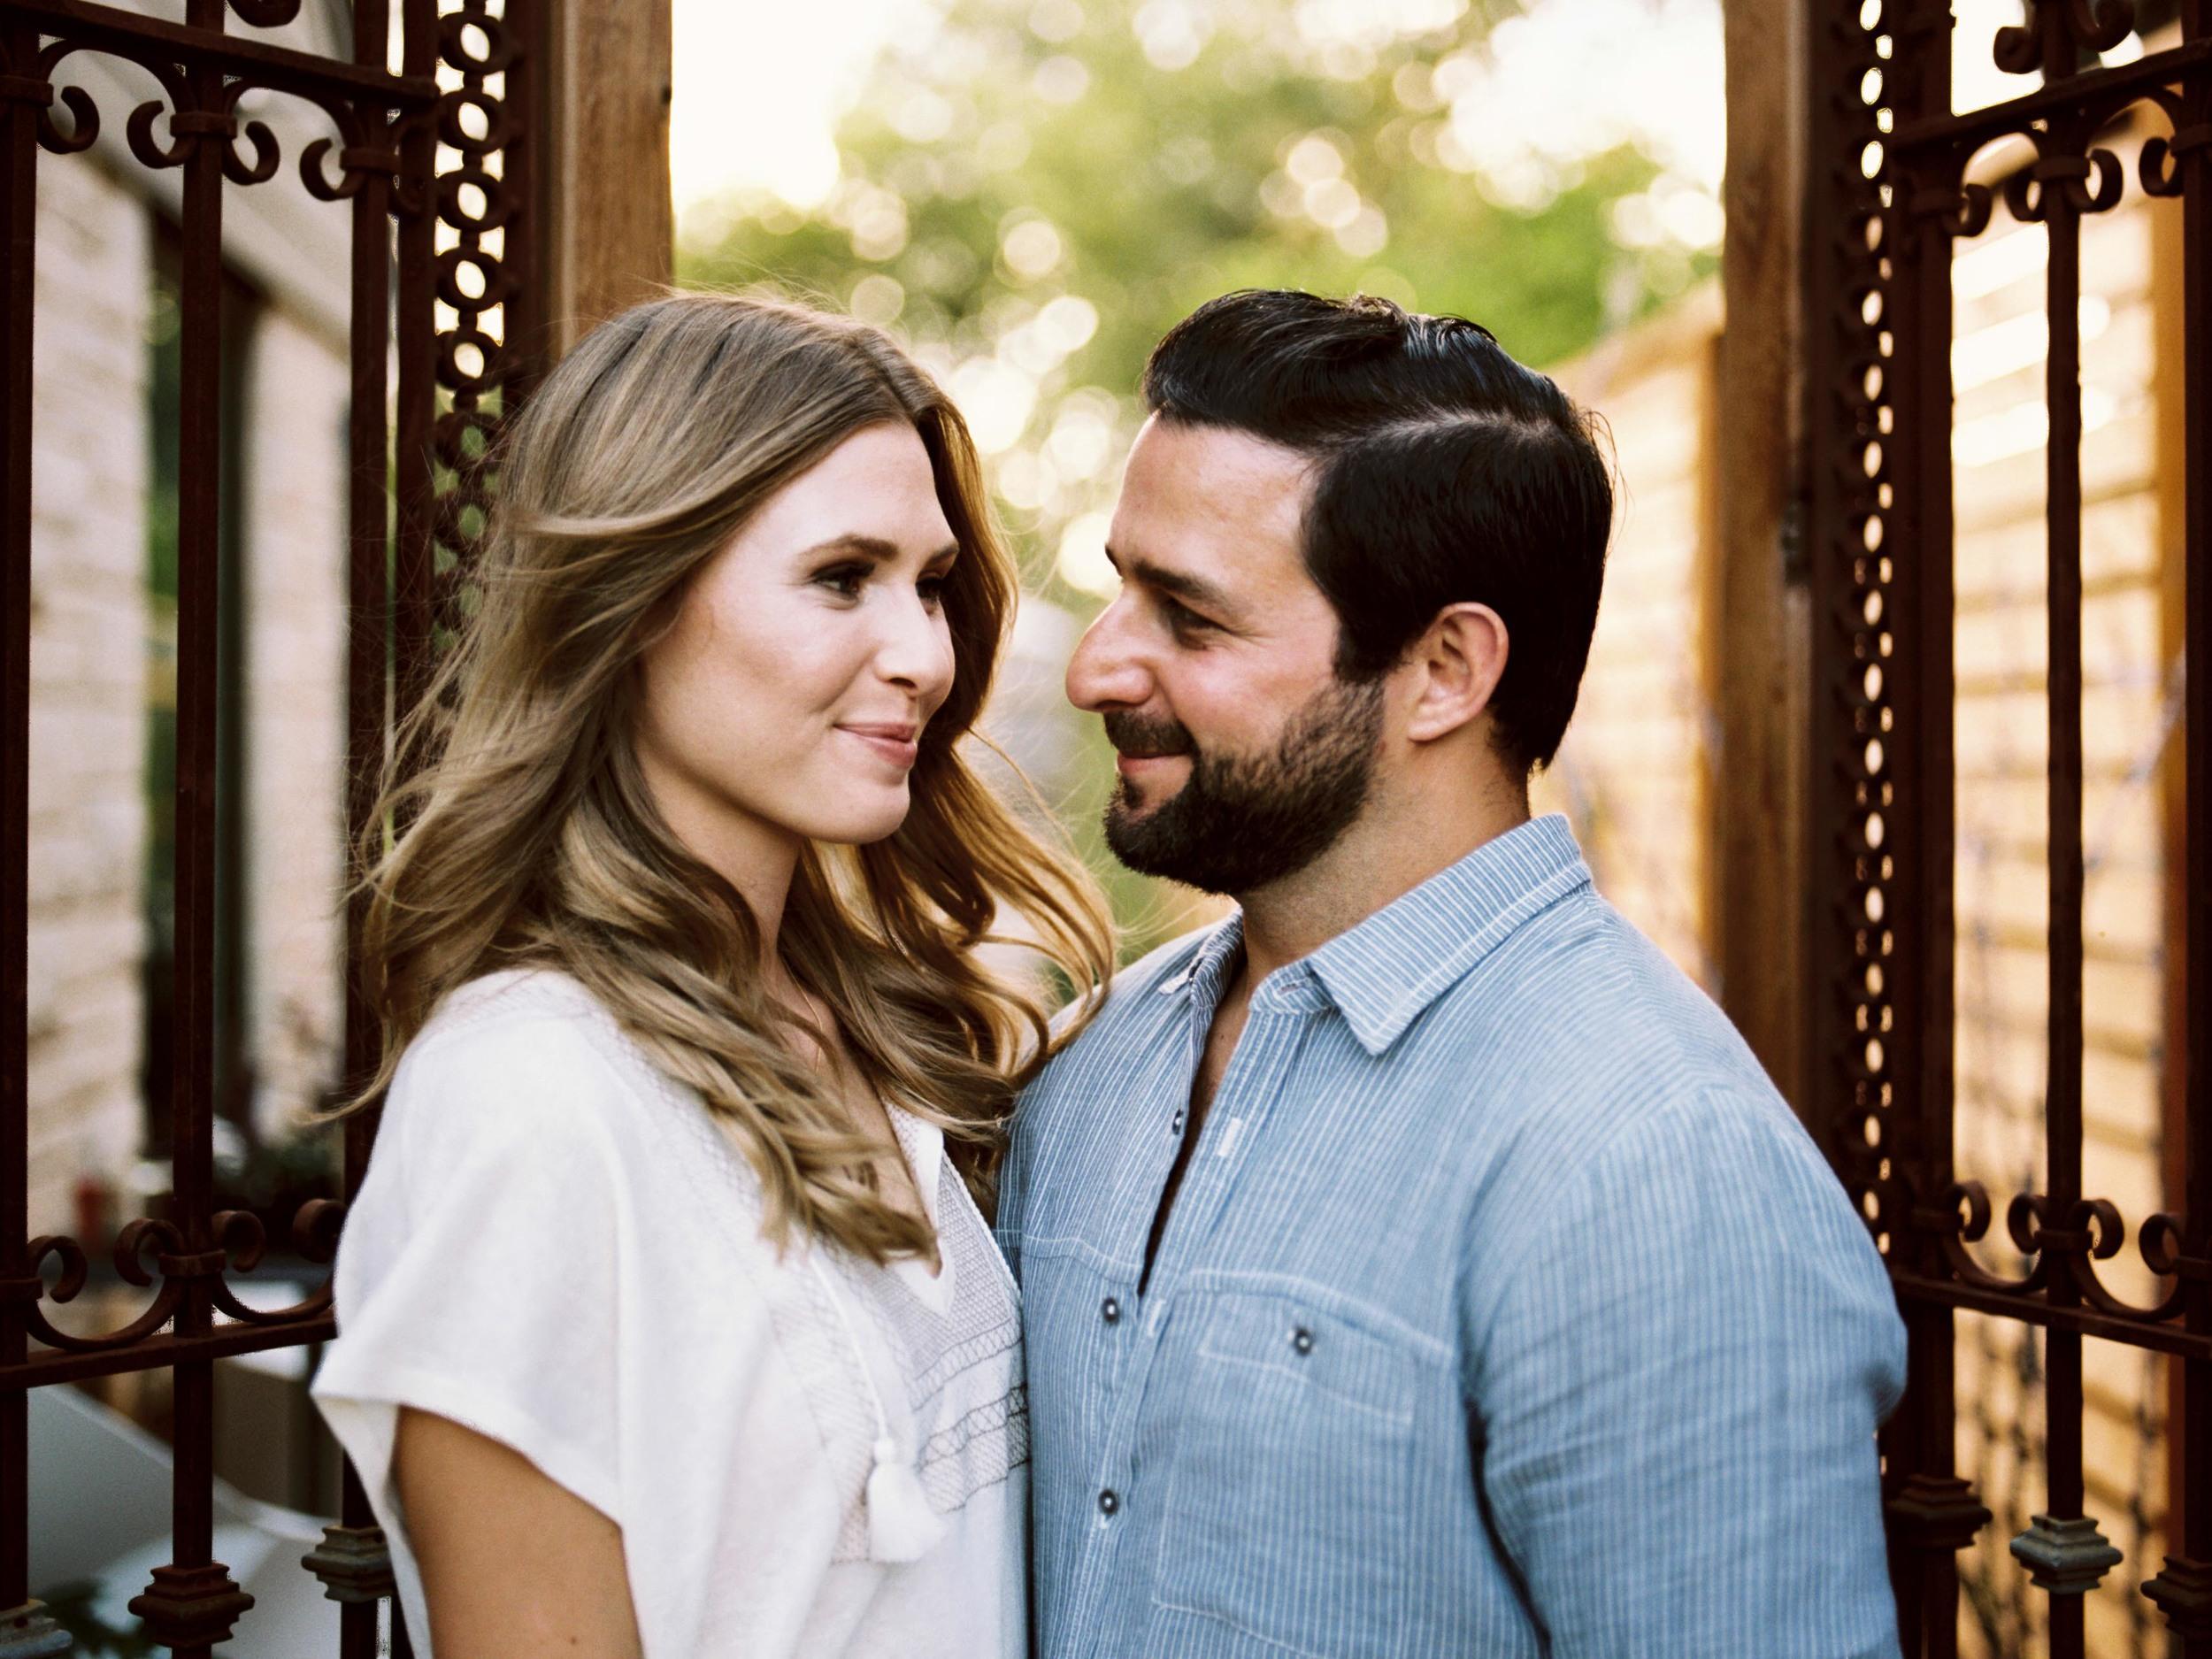 Dallas_Engagement_Wedding_Photographer-3.jpg